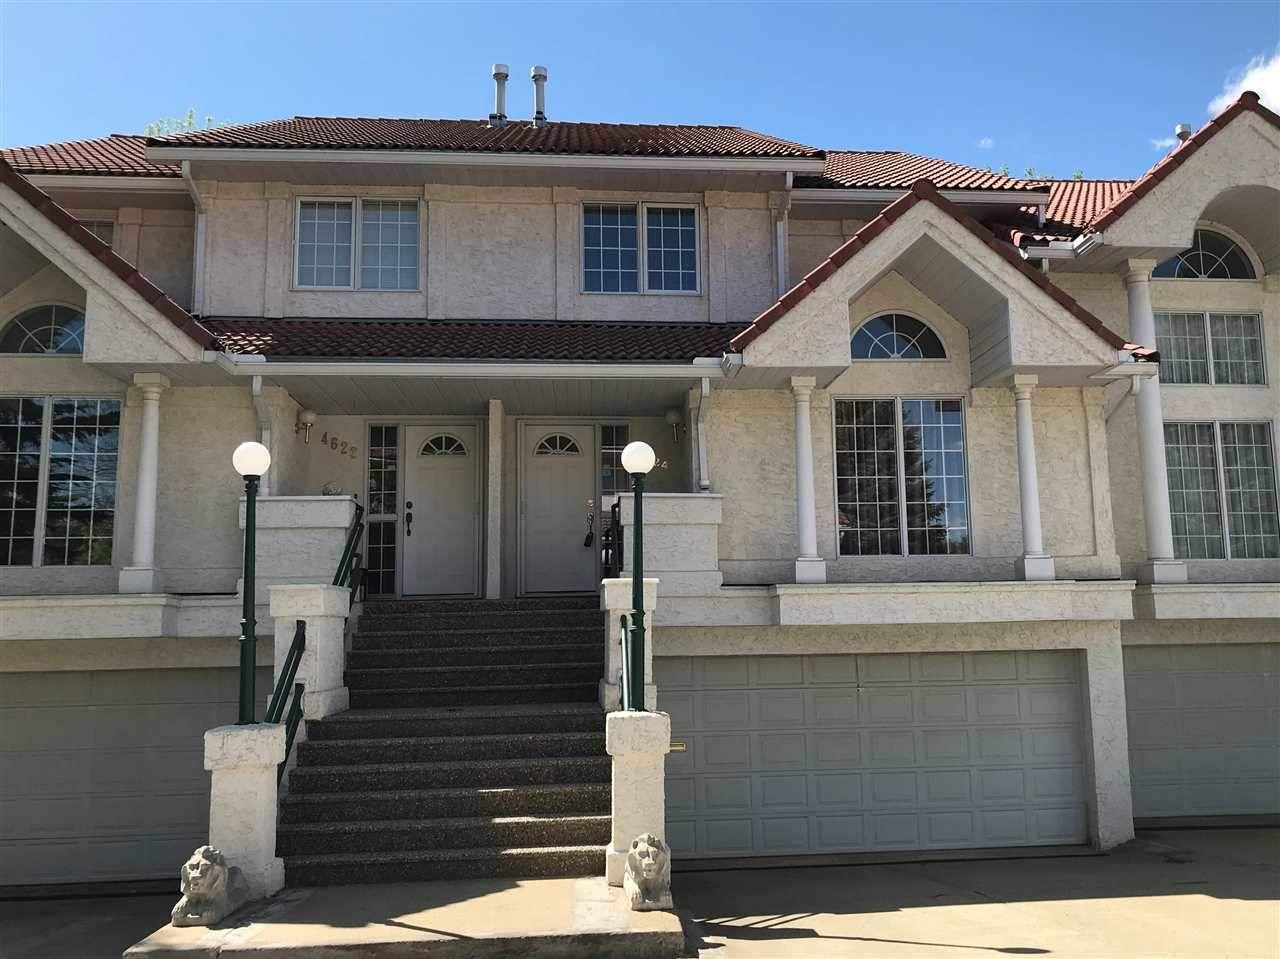 Main Photo: 4624 151 Street in Edmonton: Zone 14 Townhouse for sale : MLS®# E4225694